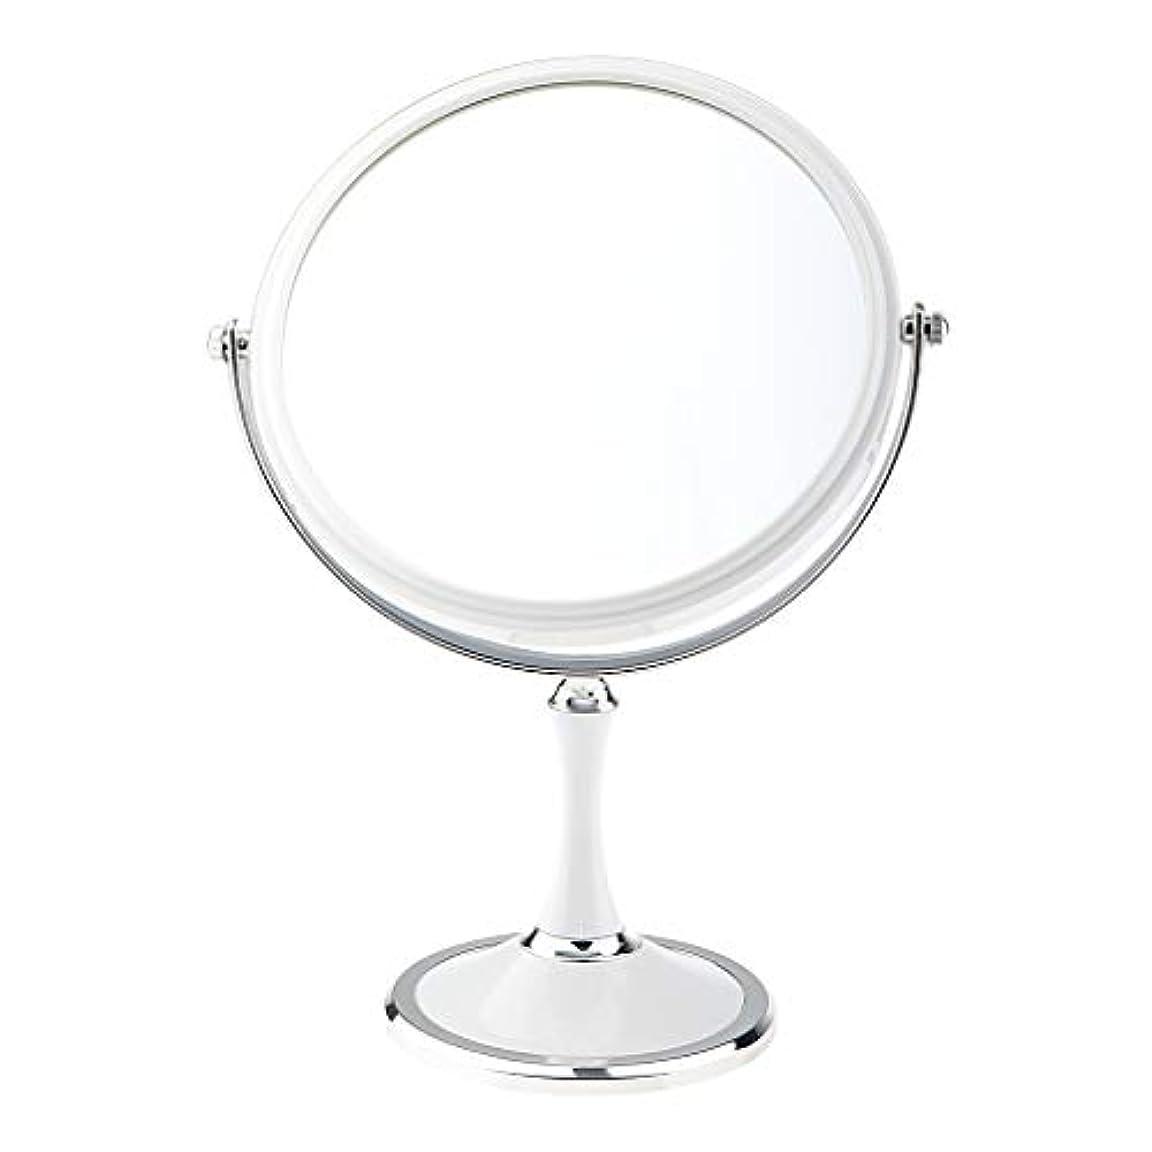 T TOOYFUL 化粧鏡 美容メイクアップ化粧ミラー&デュアルサイド1X / 3X拡大鏡スタンド - 白